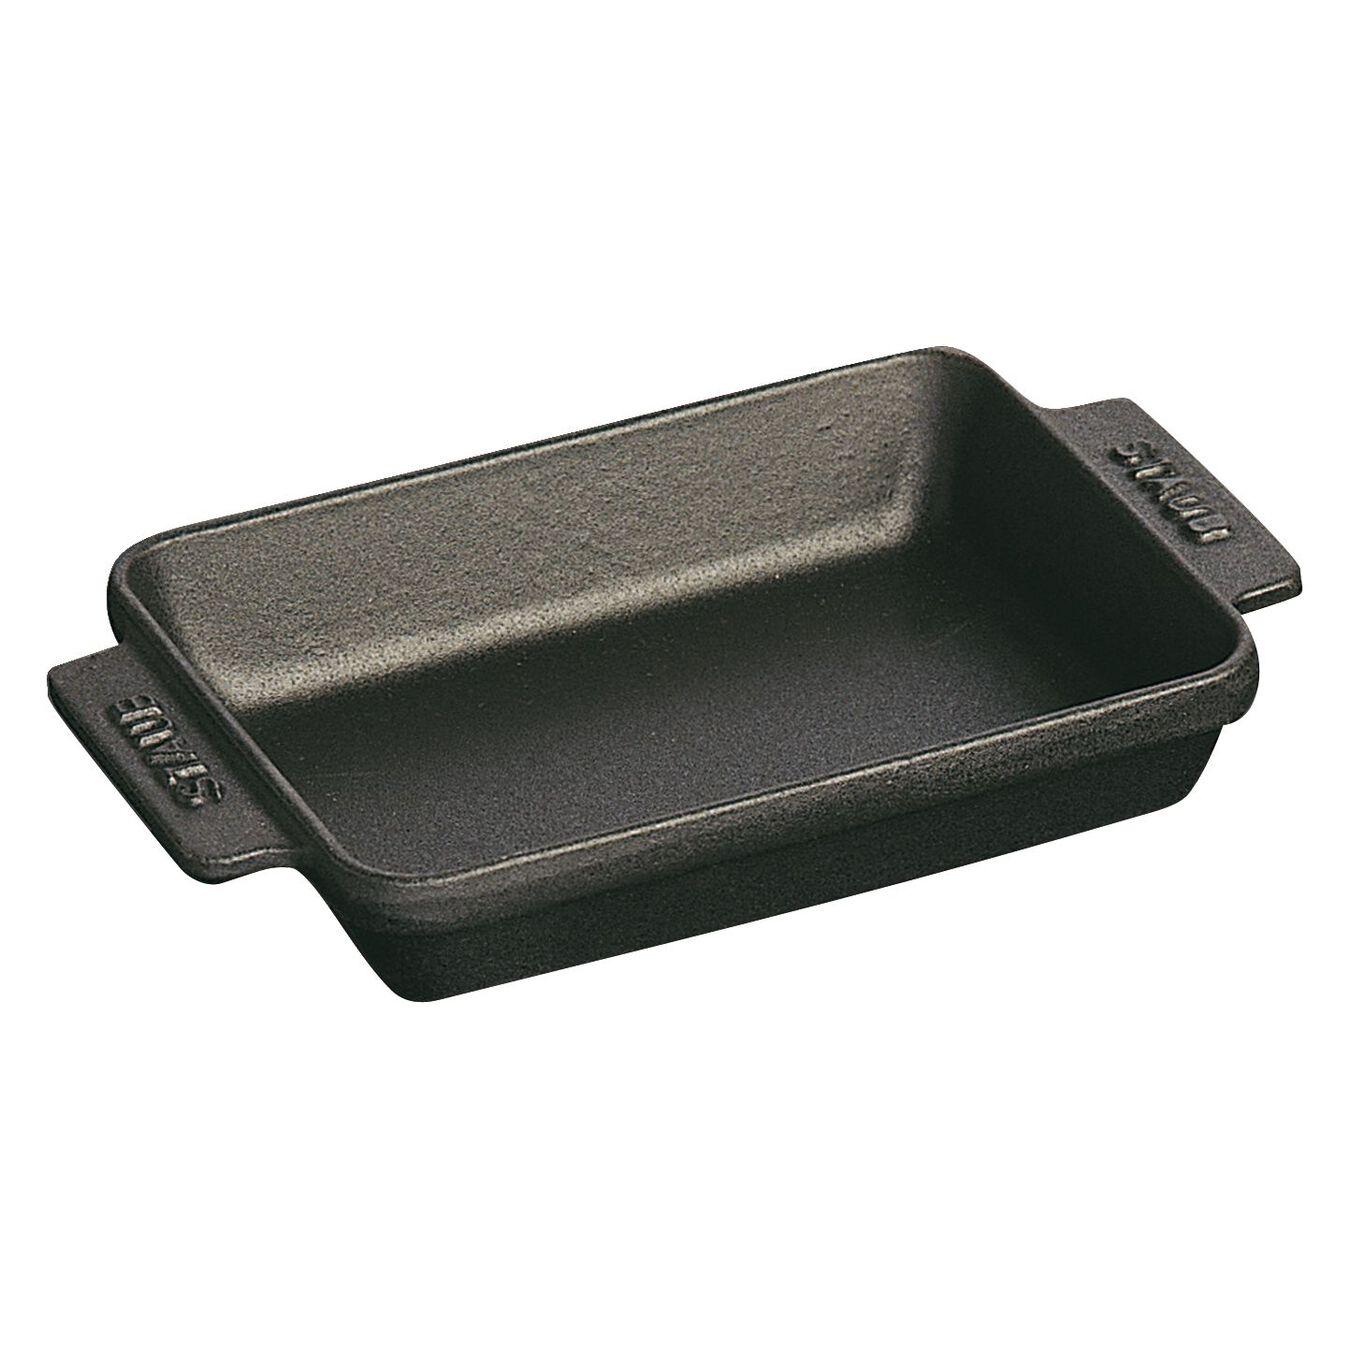 Cast iron rectangular Oven dish, Black,,large 1